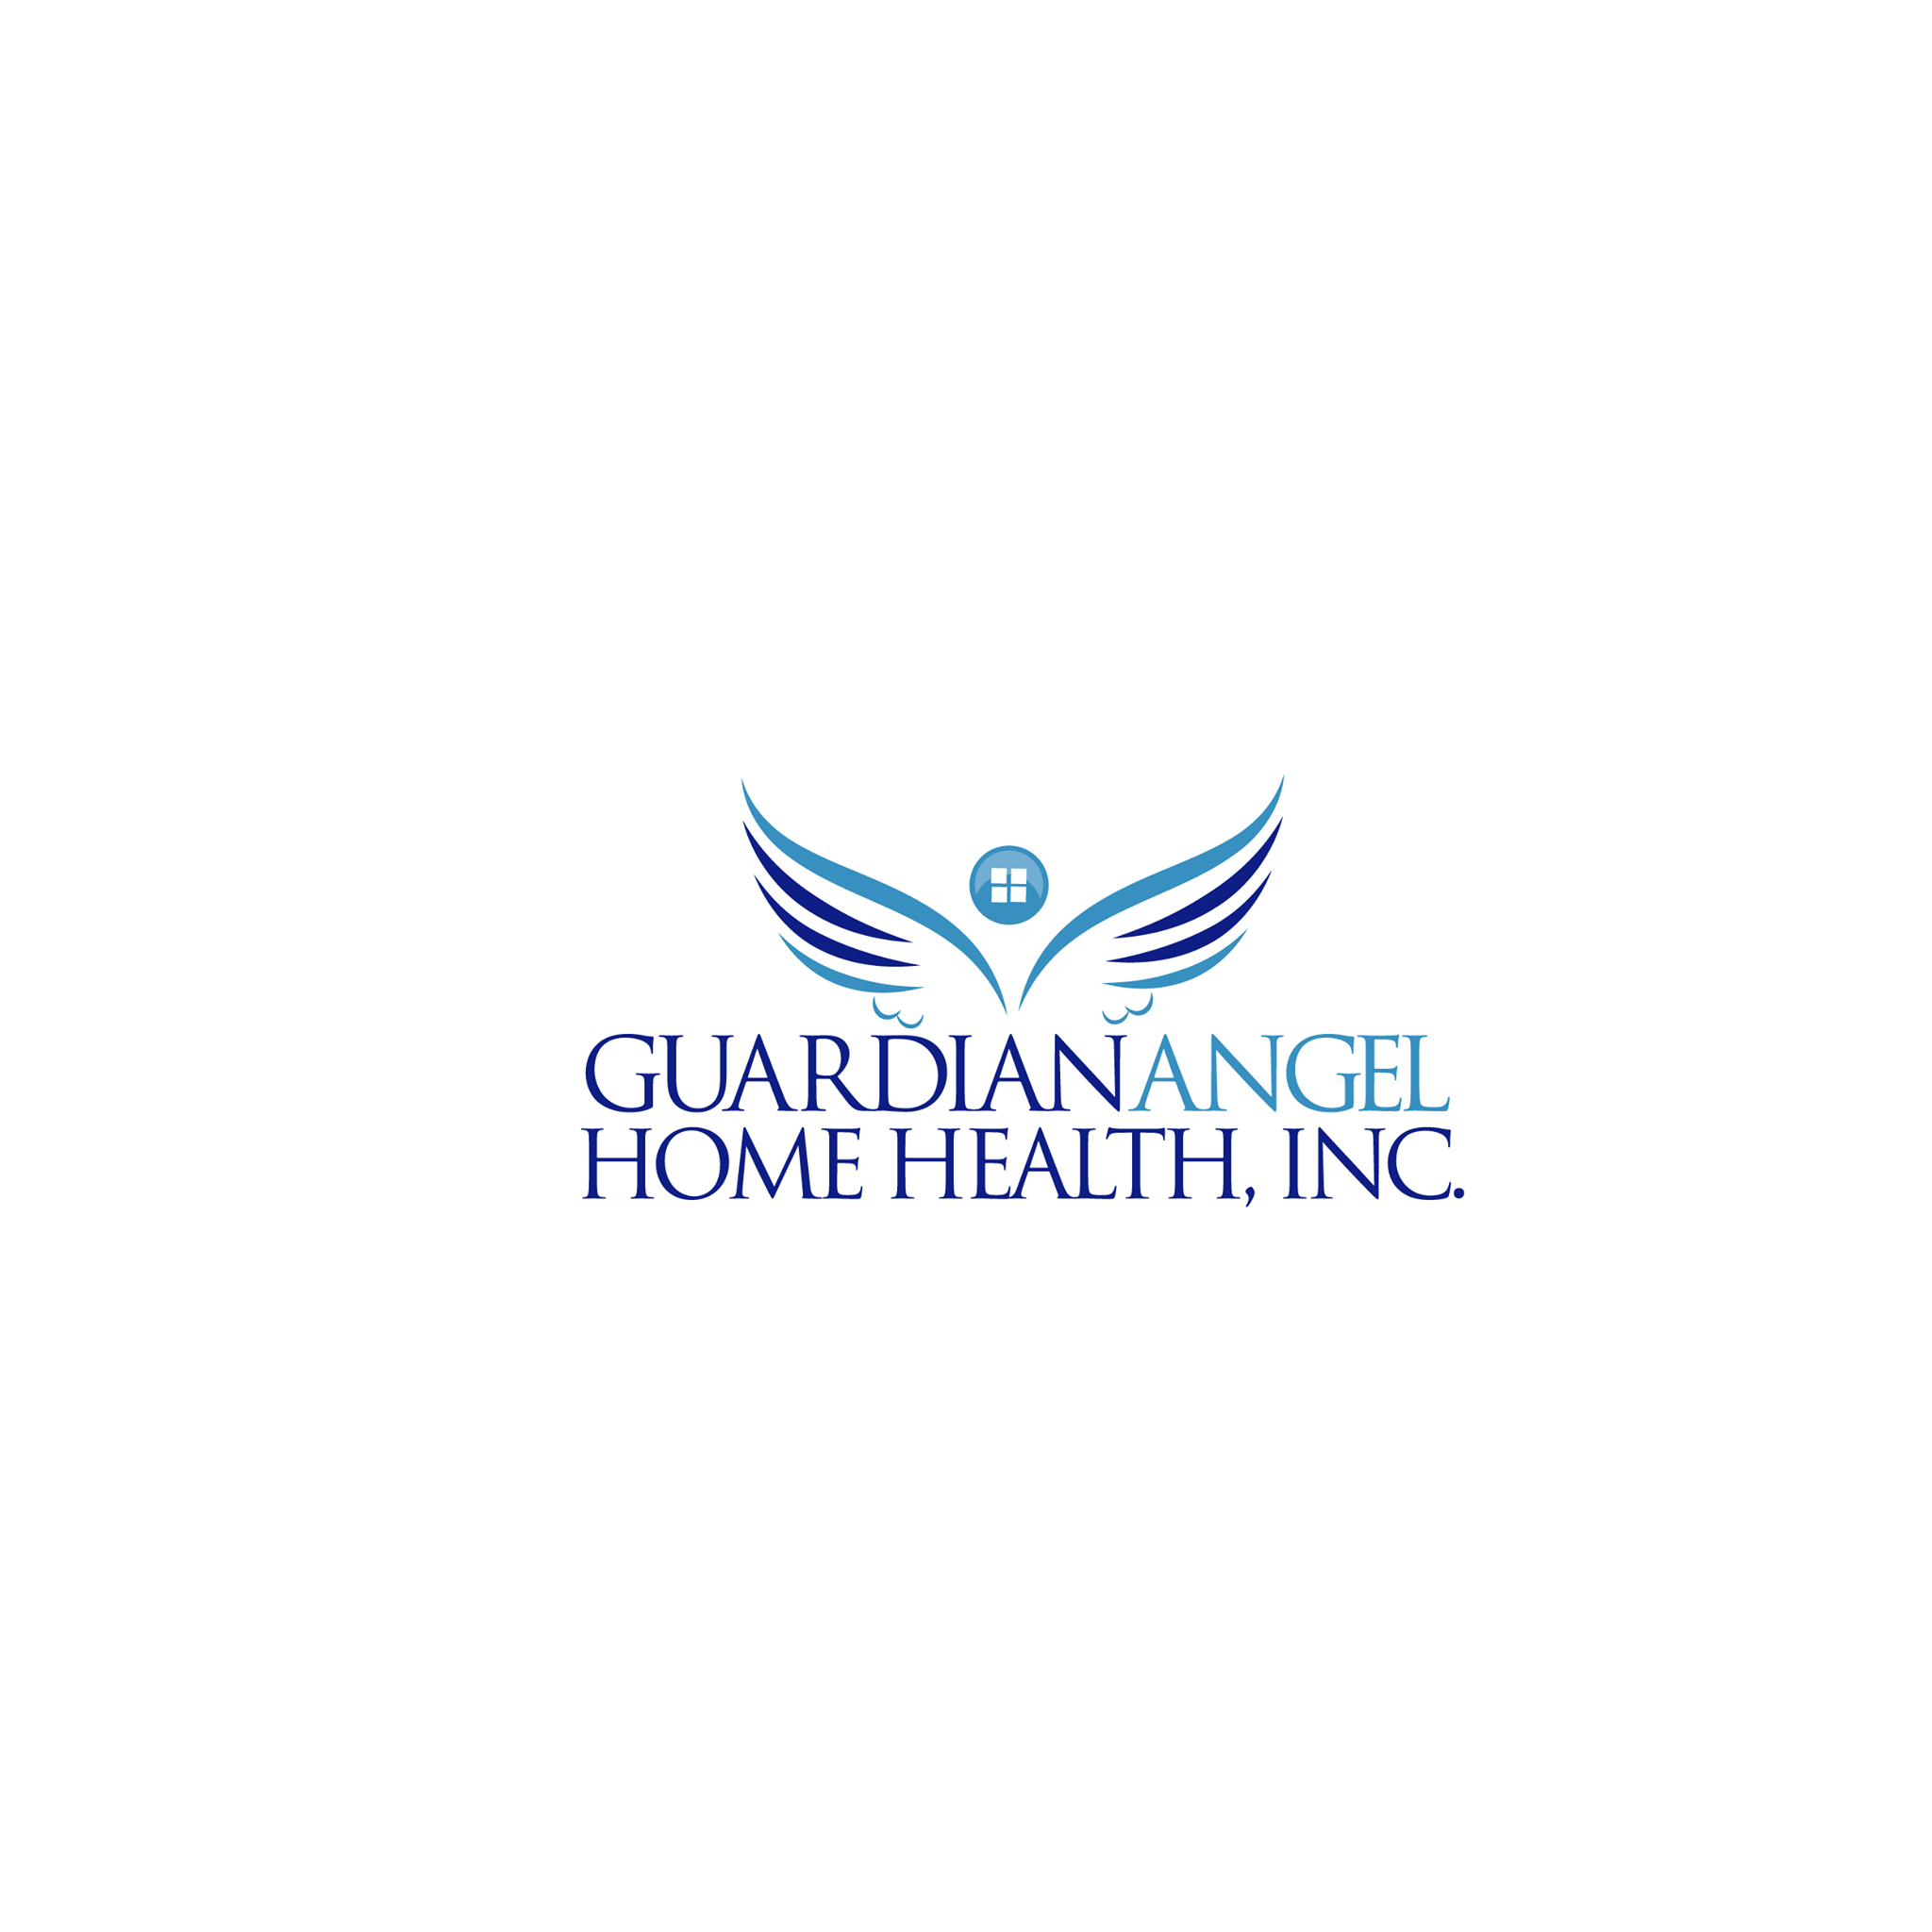 Guardian Angel Home Health, Inc.